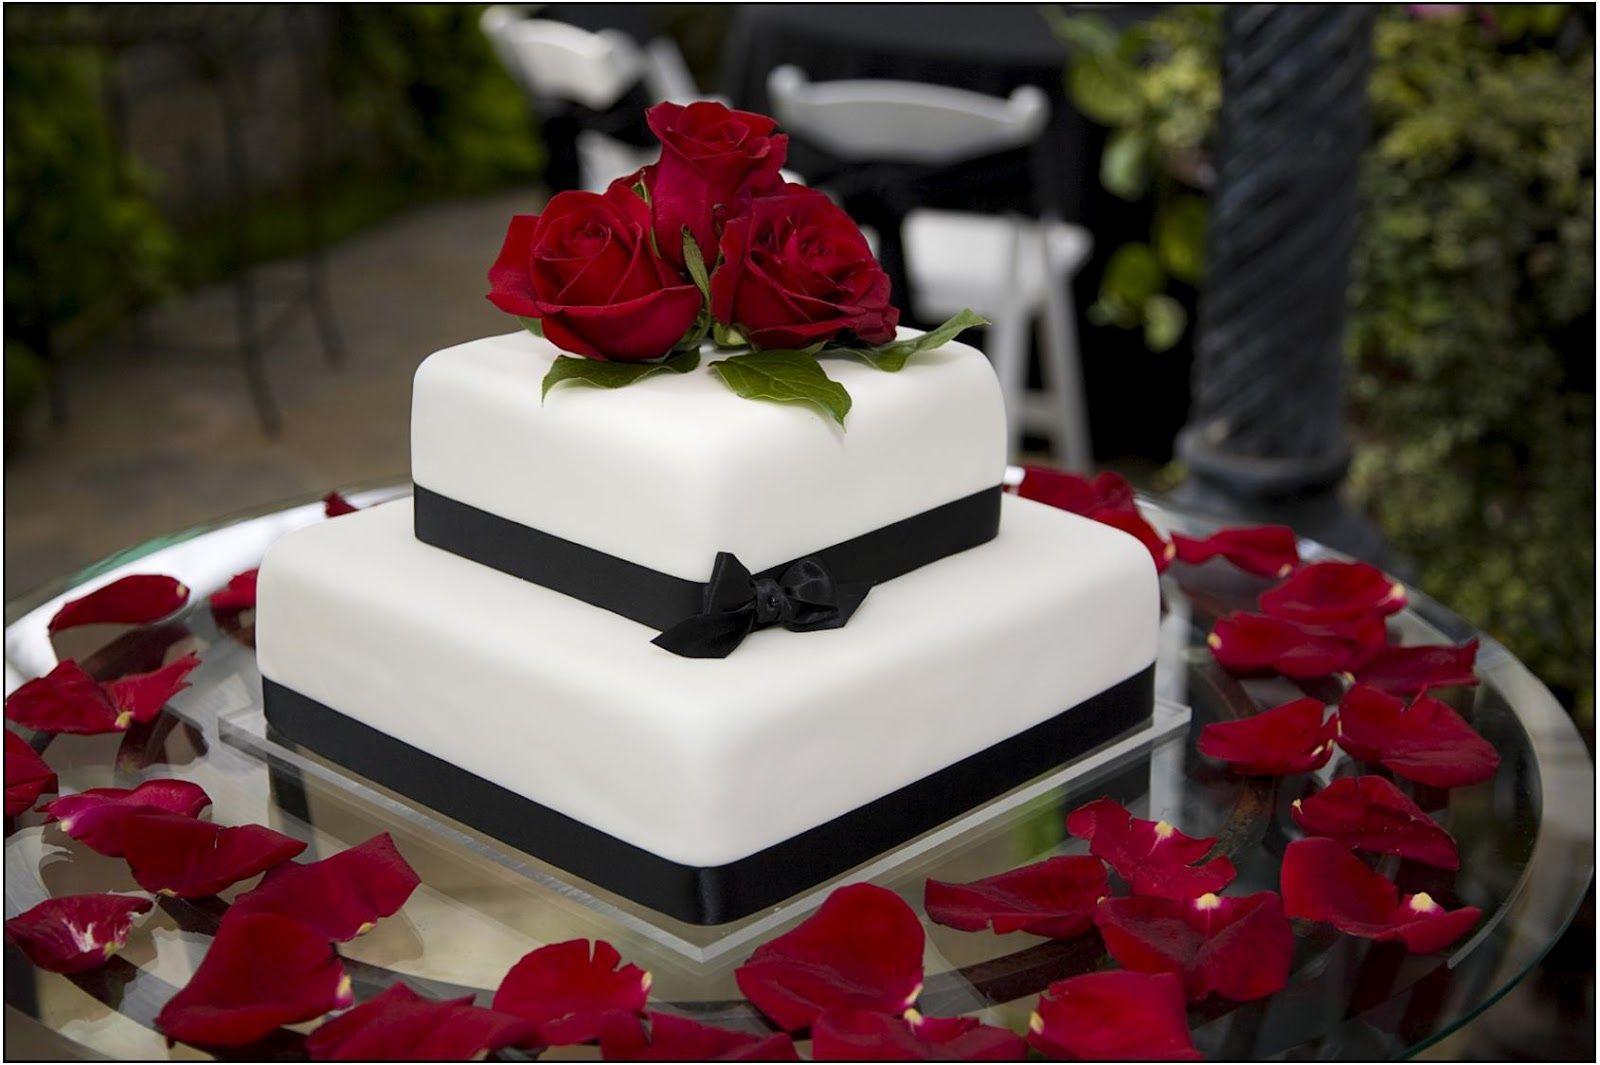 Foto de Bolo de Casamento